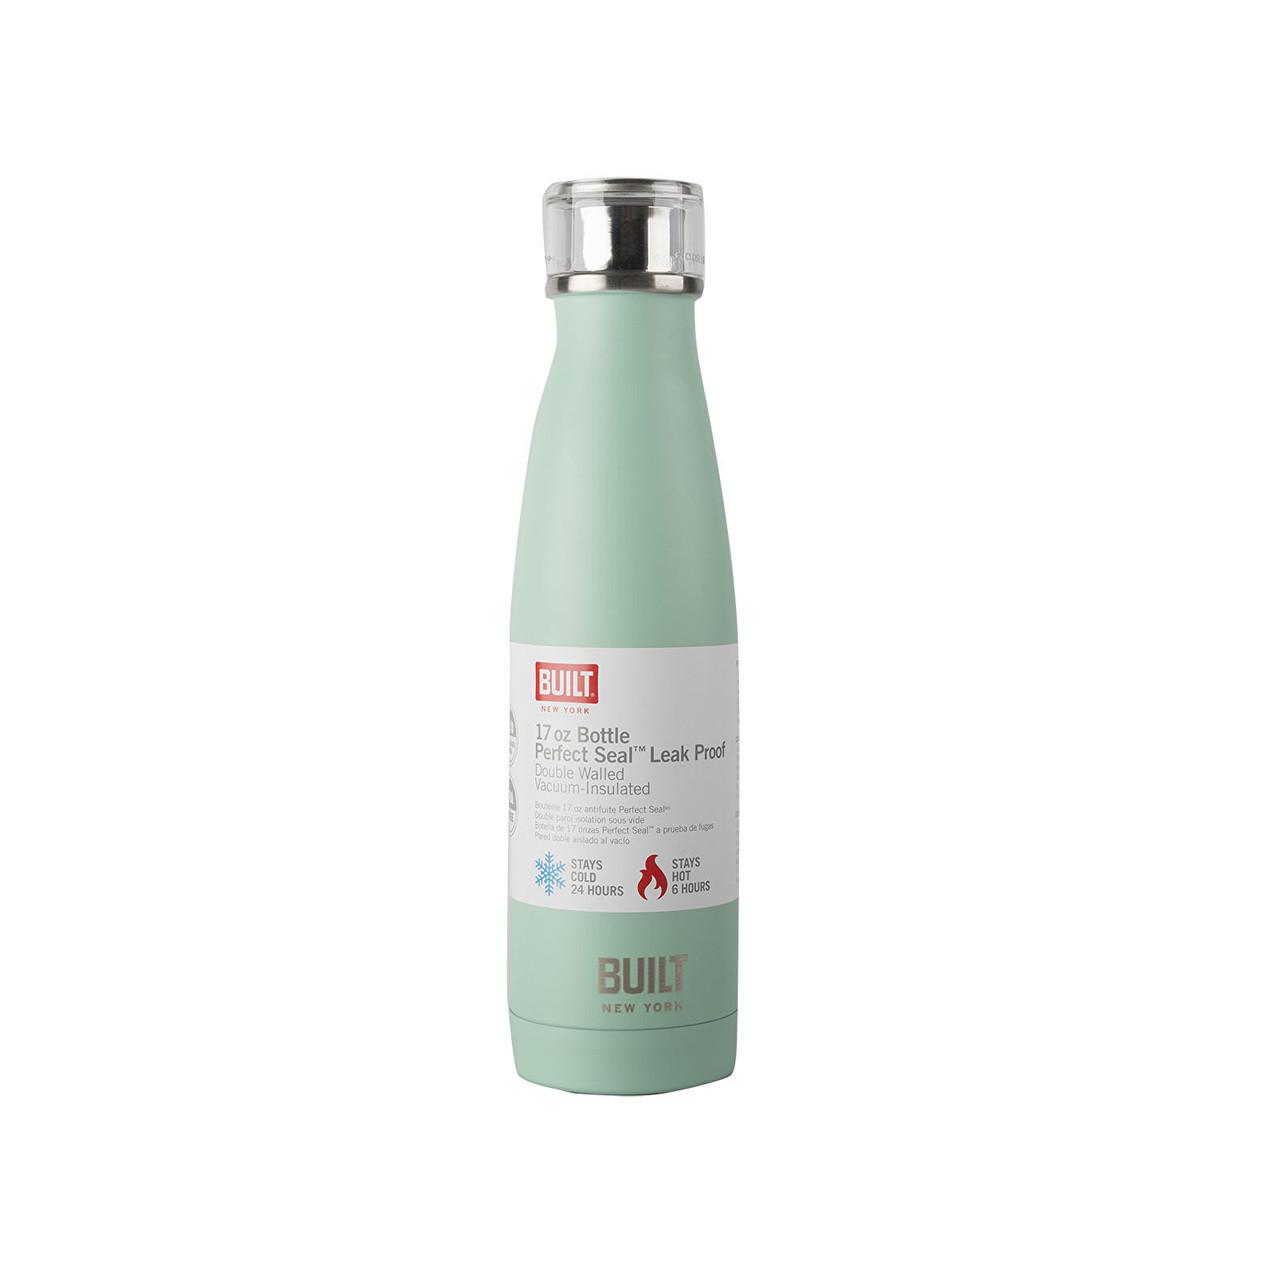 Built Double Walled Stainless Steel Water Bottle - 17oz Mint Green